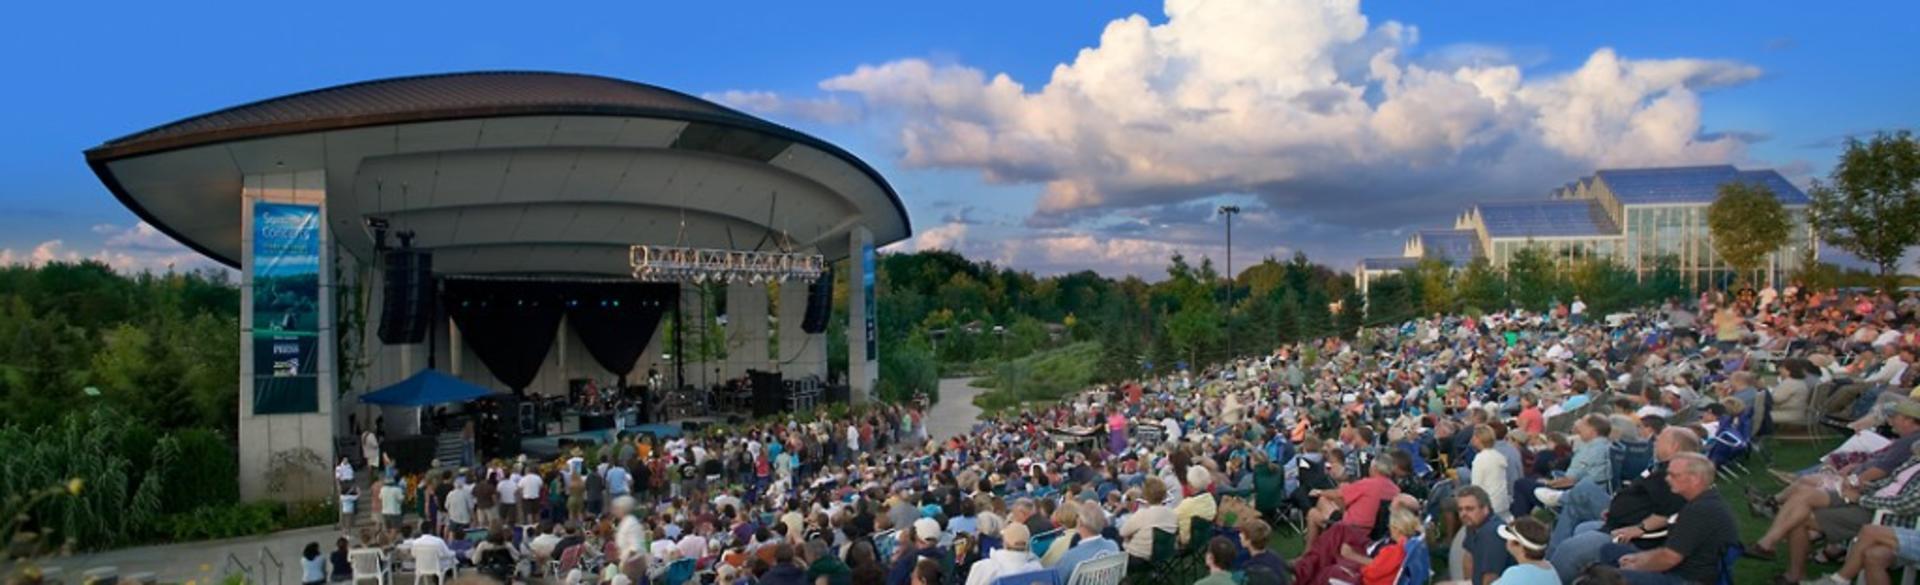 Fifth Third Bank Summer Concert Series at Meijer Gardens